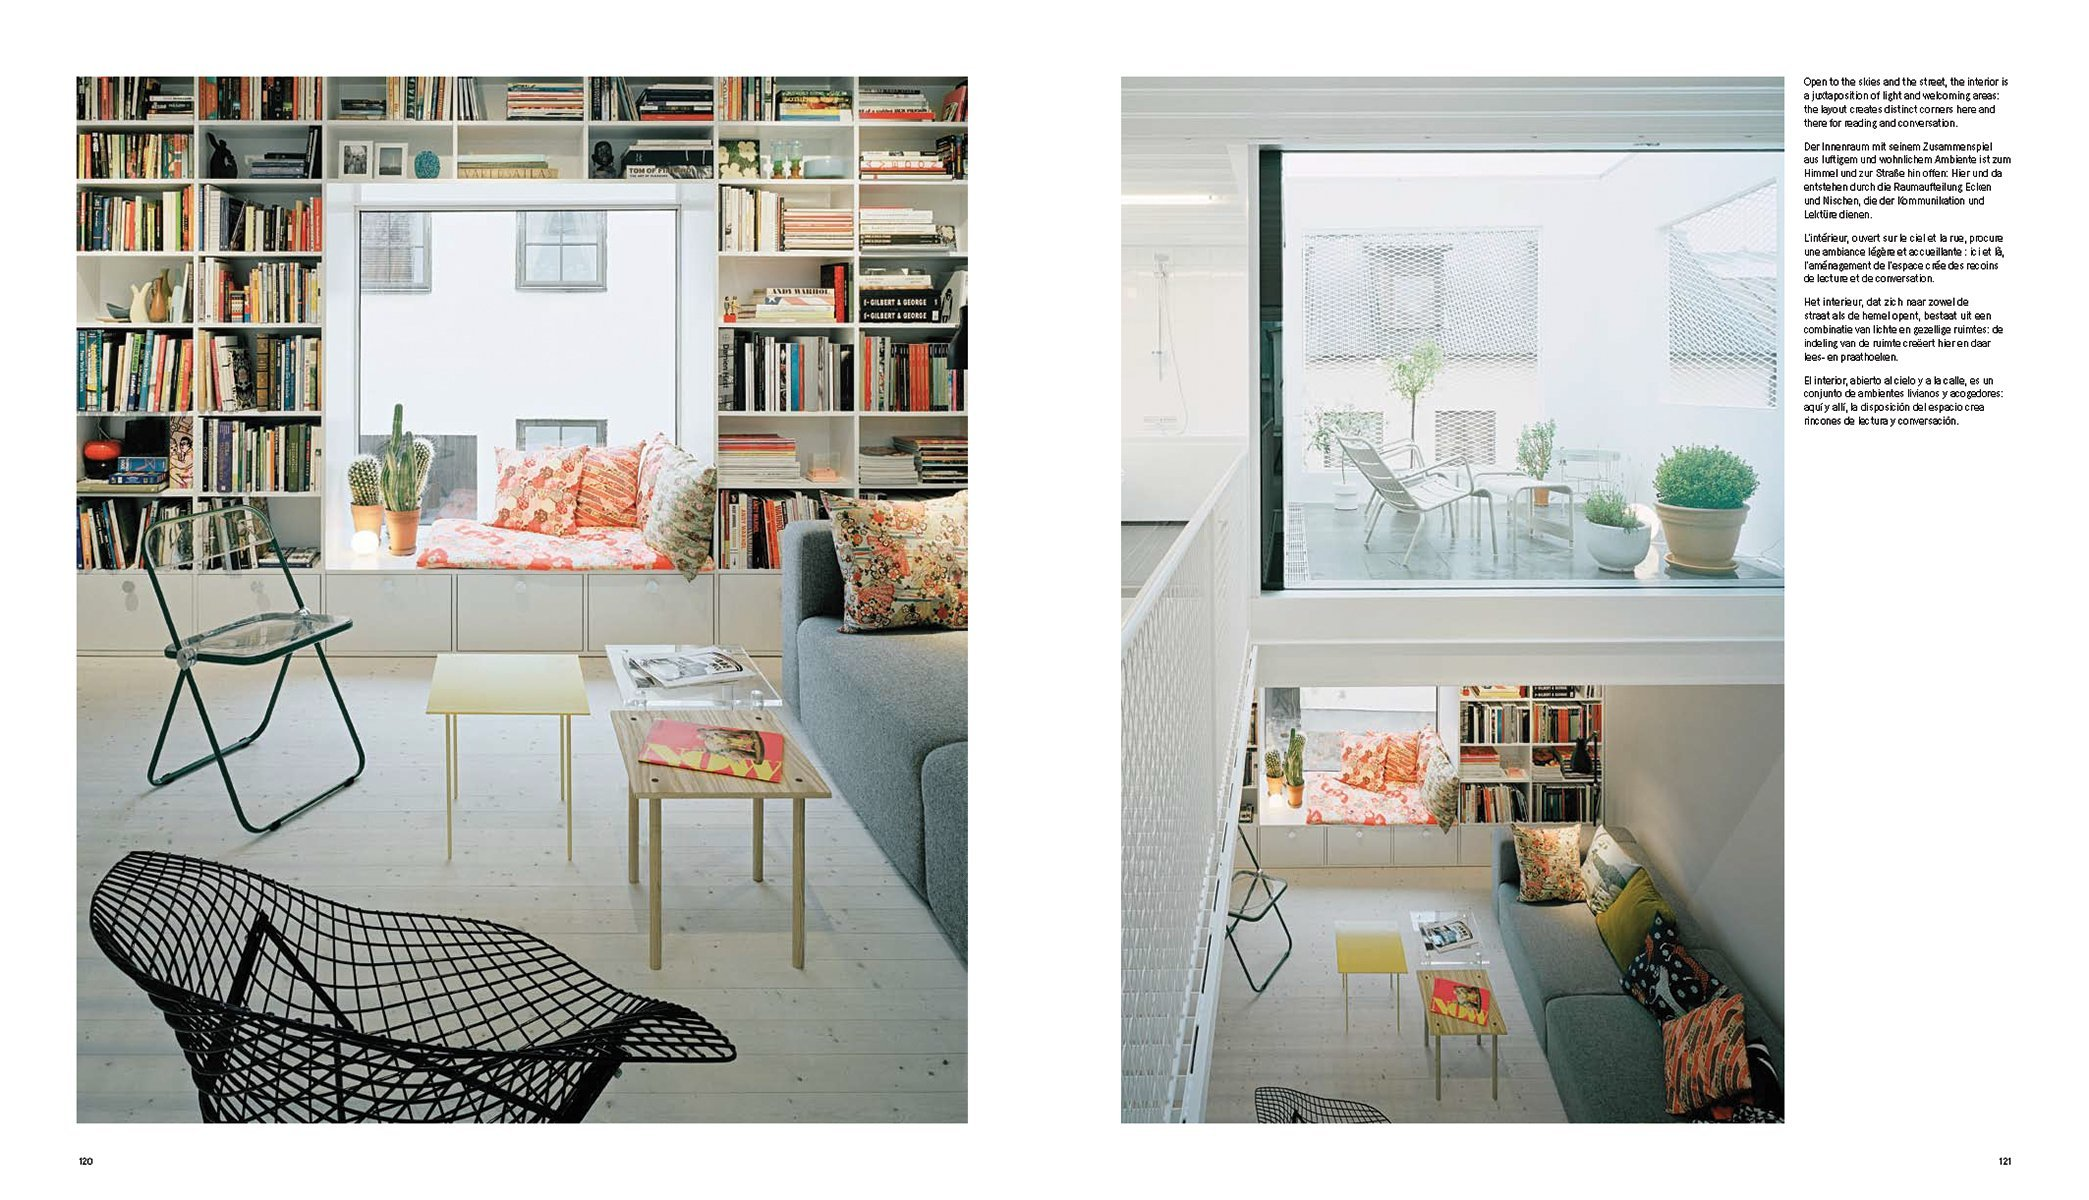 202 Outstanding House Ideas: Bridget Vranckx: 9781770855694: Amazon ...